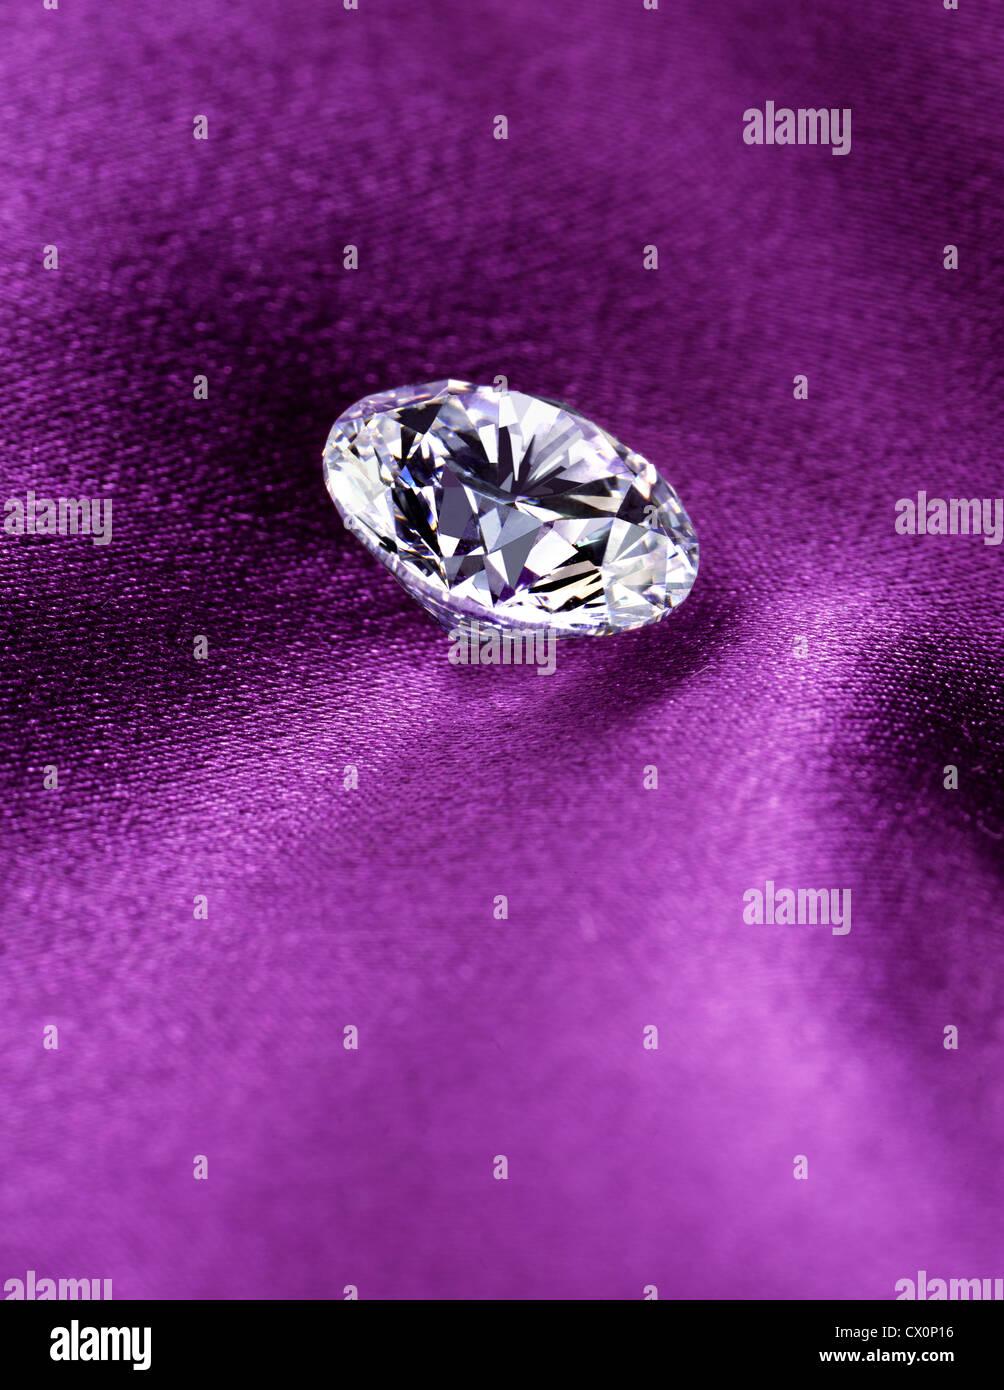 Diamond -Hearts on Fire - Stock Image